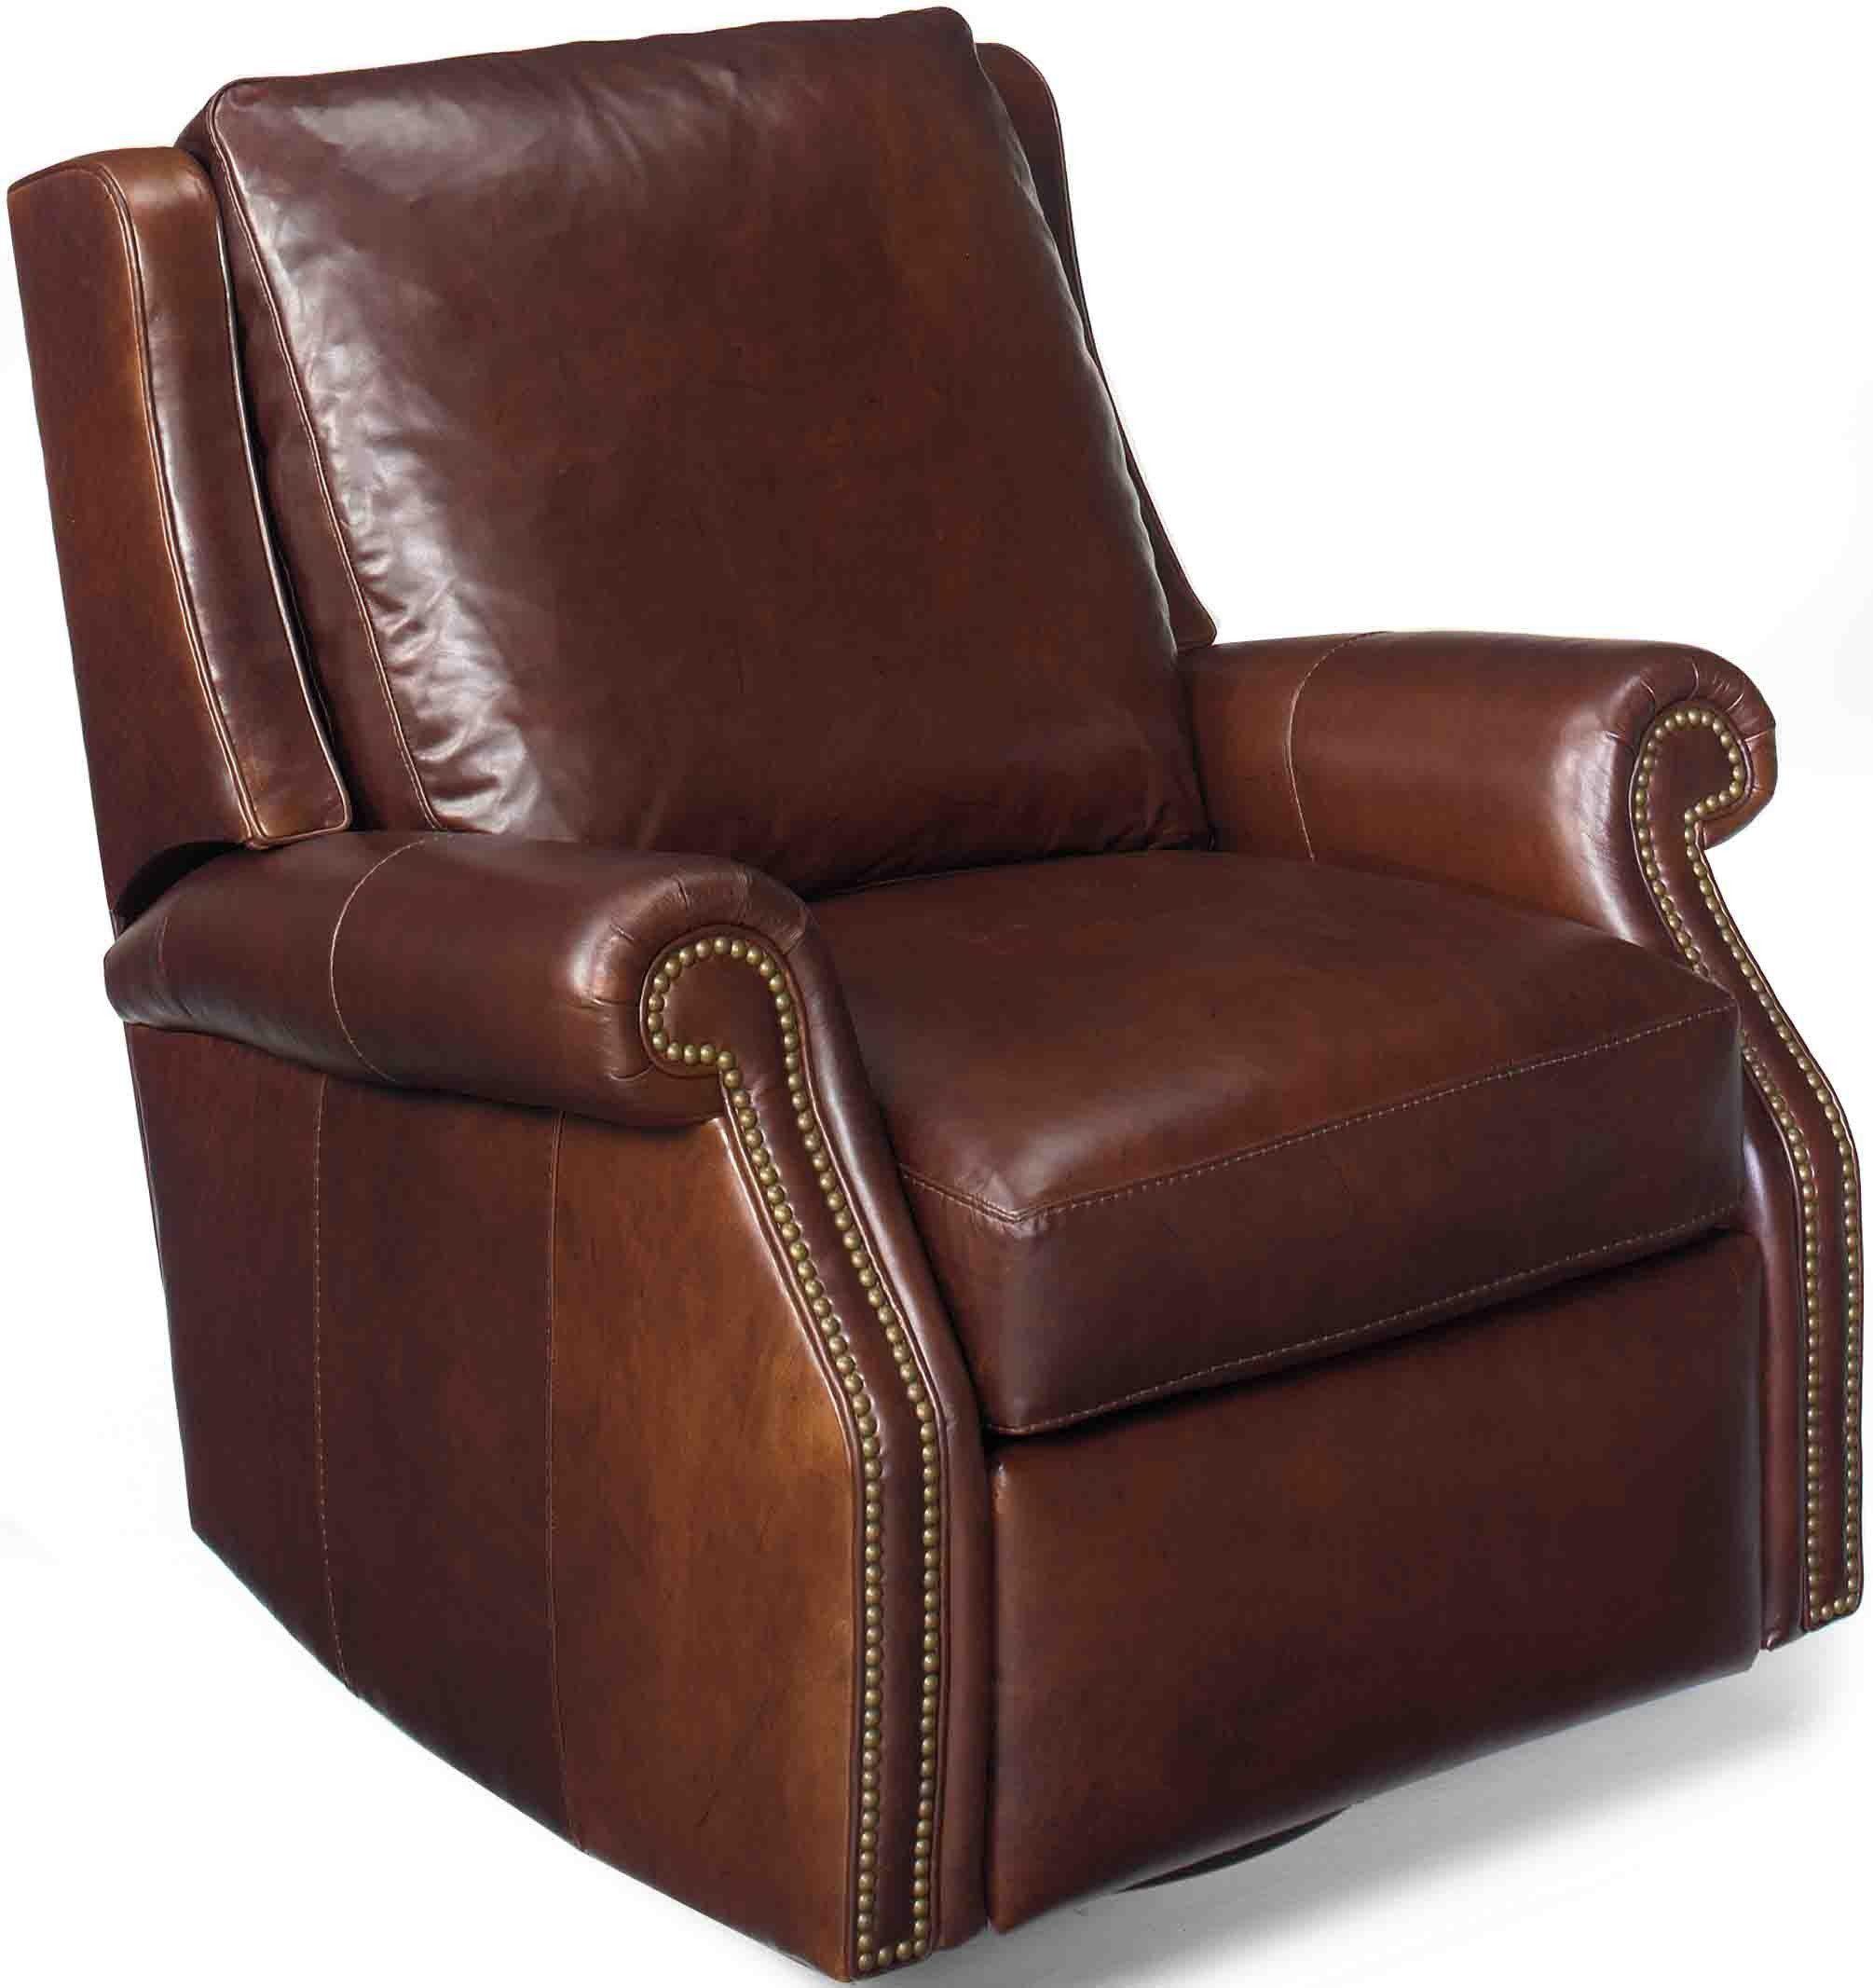 Rocker Chair Sg Eames Aluminum Group Management Bradington Young Barcelo Swivel Glider Recliner By 7411